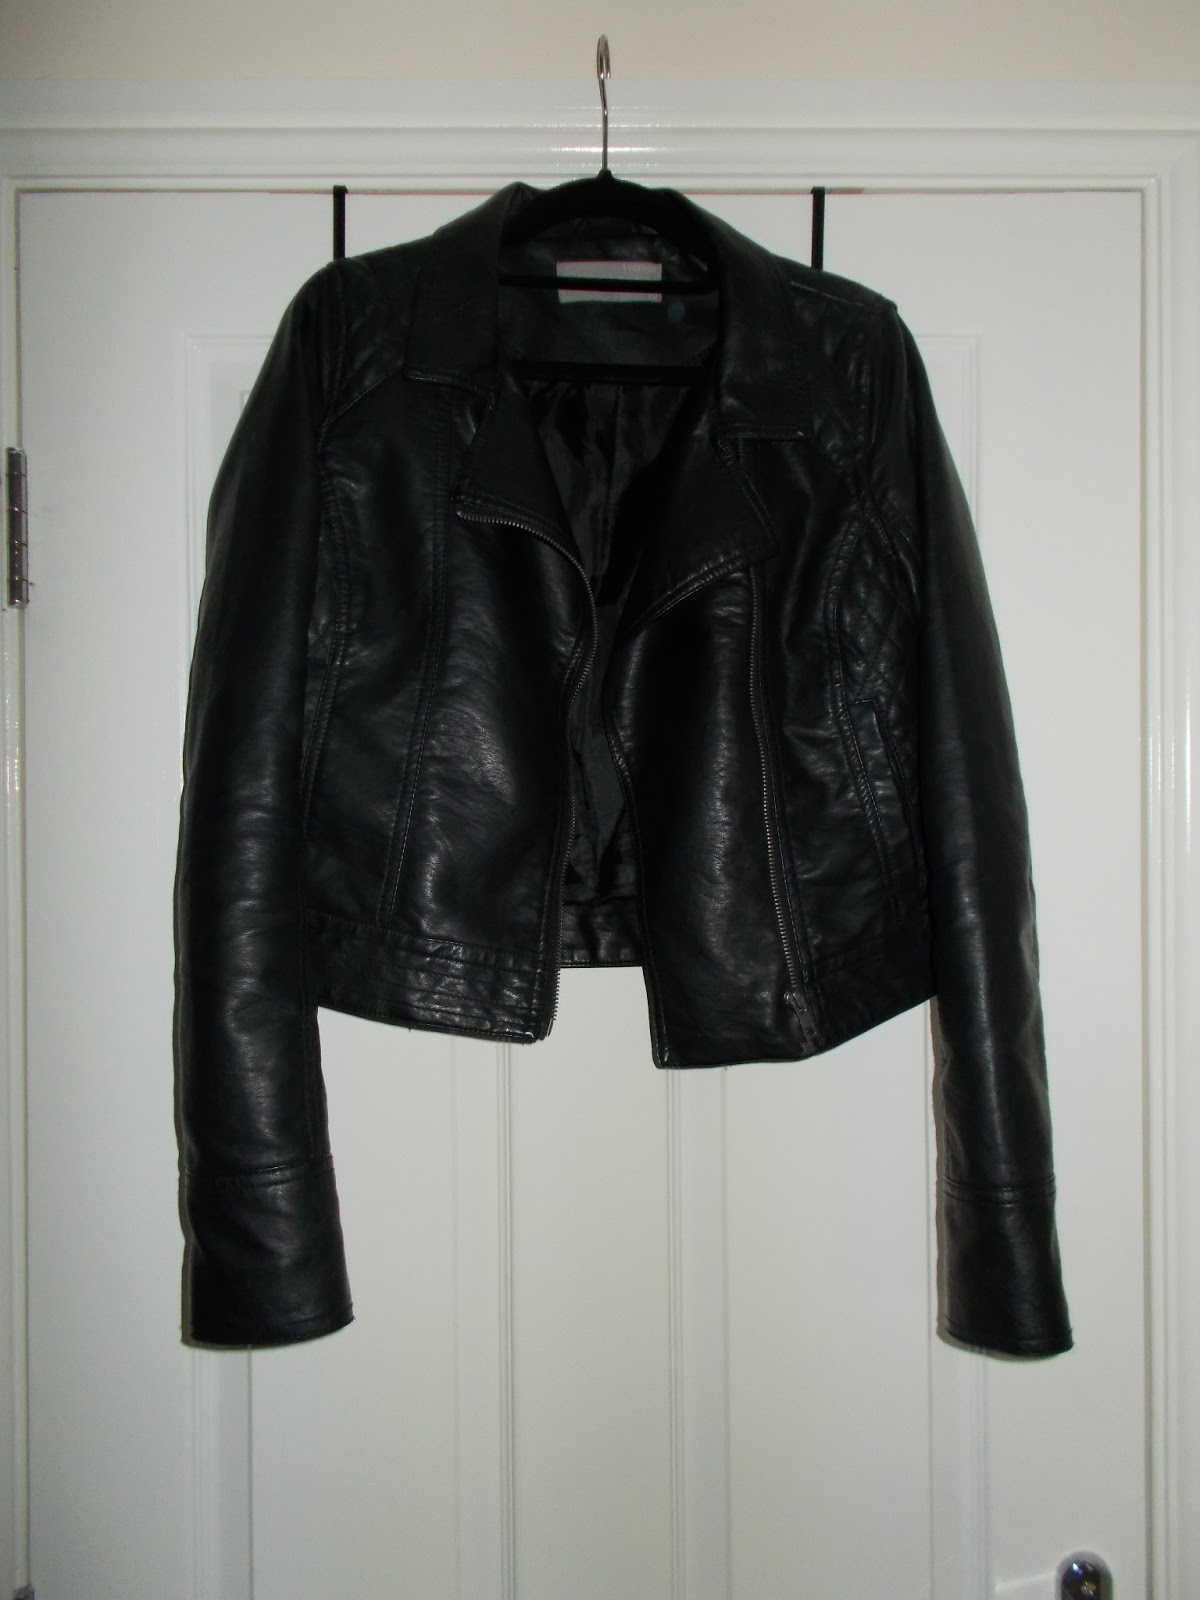 Tk maxx leather jackets